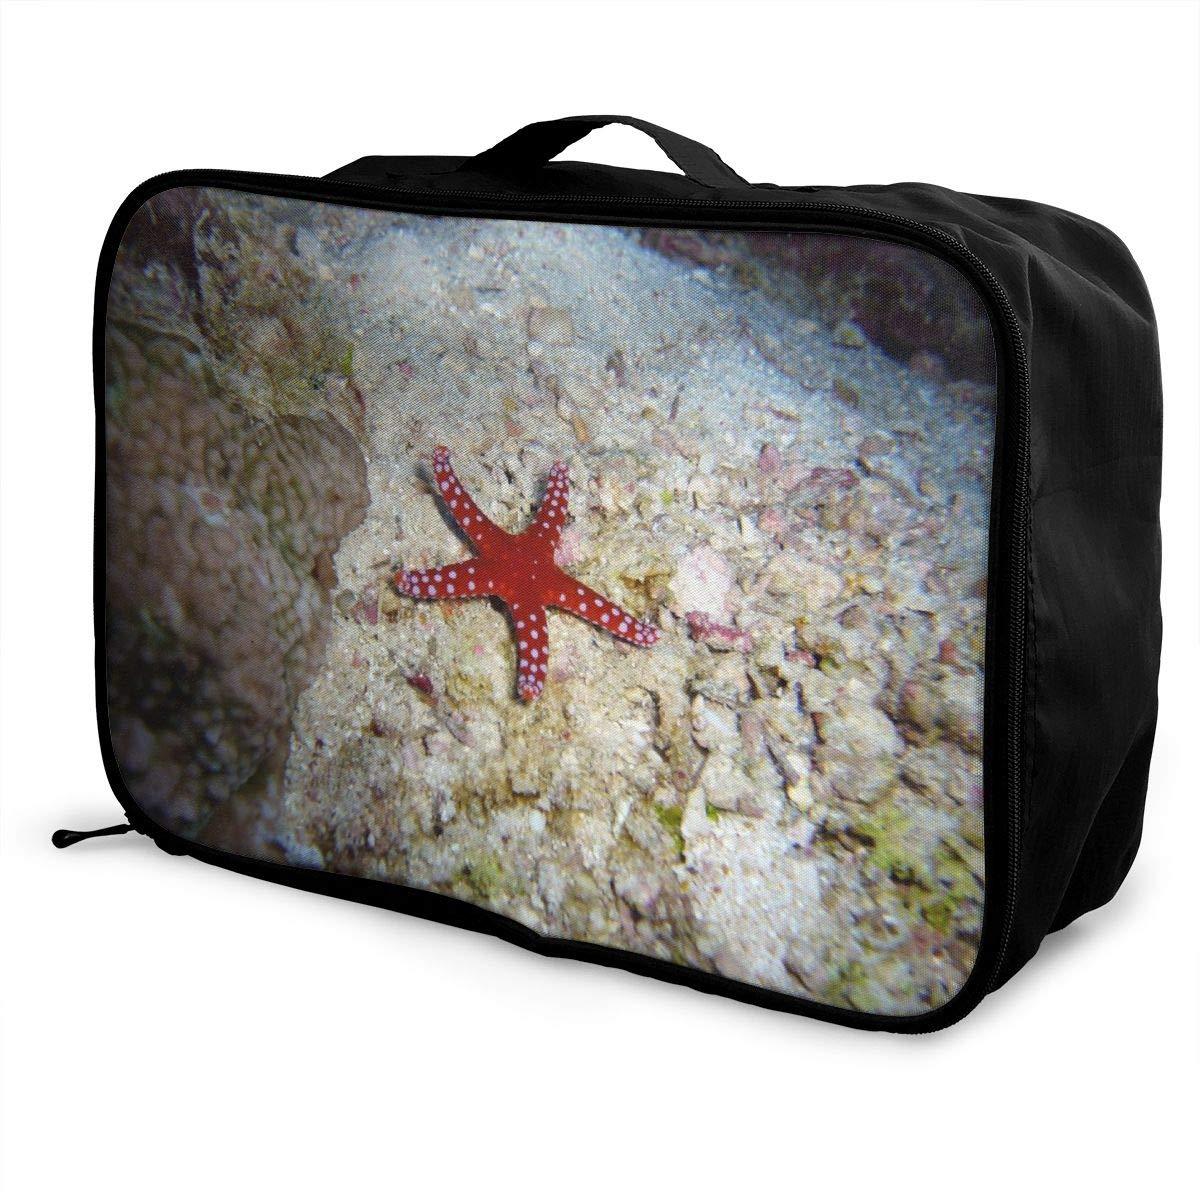 Water Sea Starfish Travel Lightweight Waterproof Foldable Storage Carry Luggage Large Capacity Portable Luggage Bag Duffel Bag